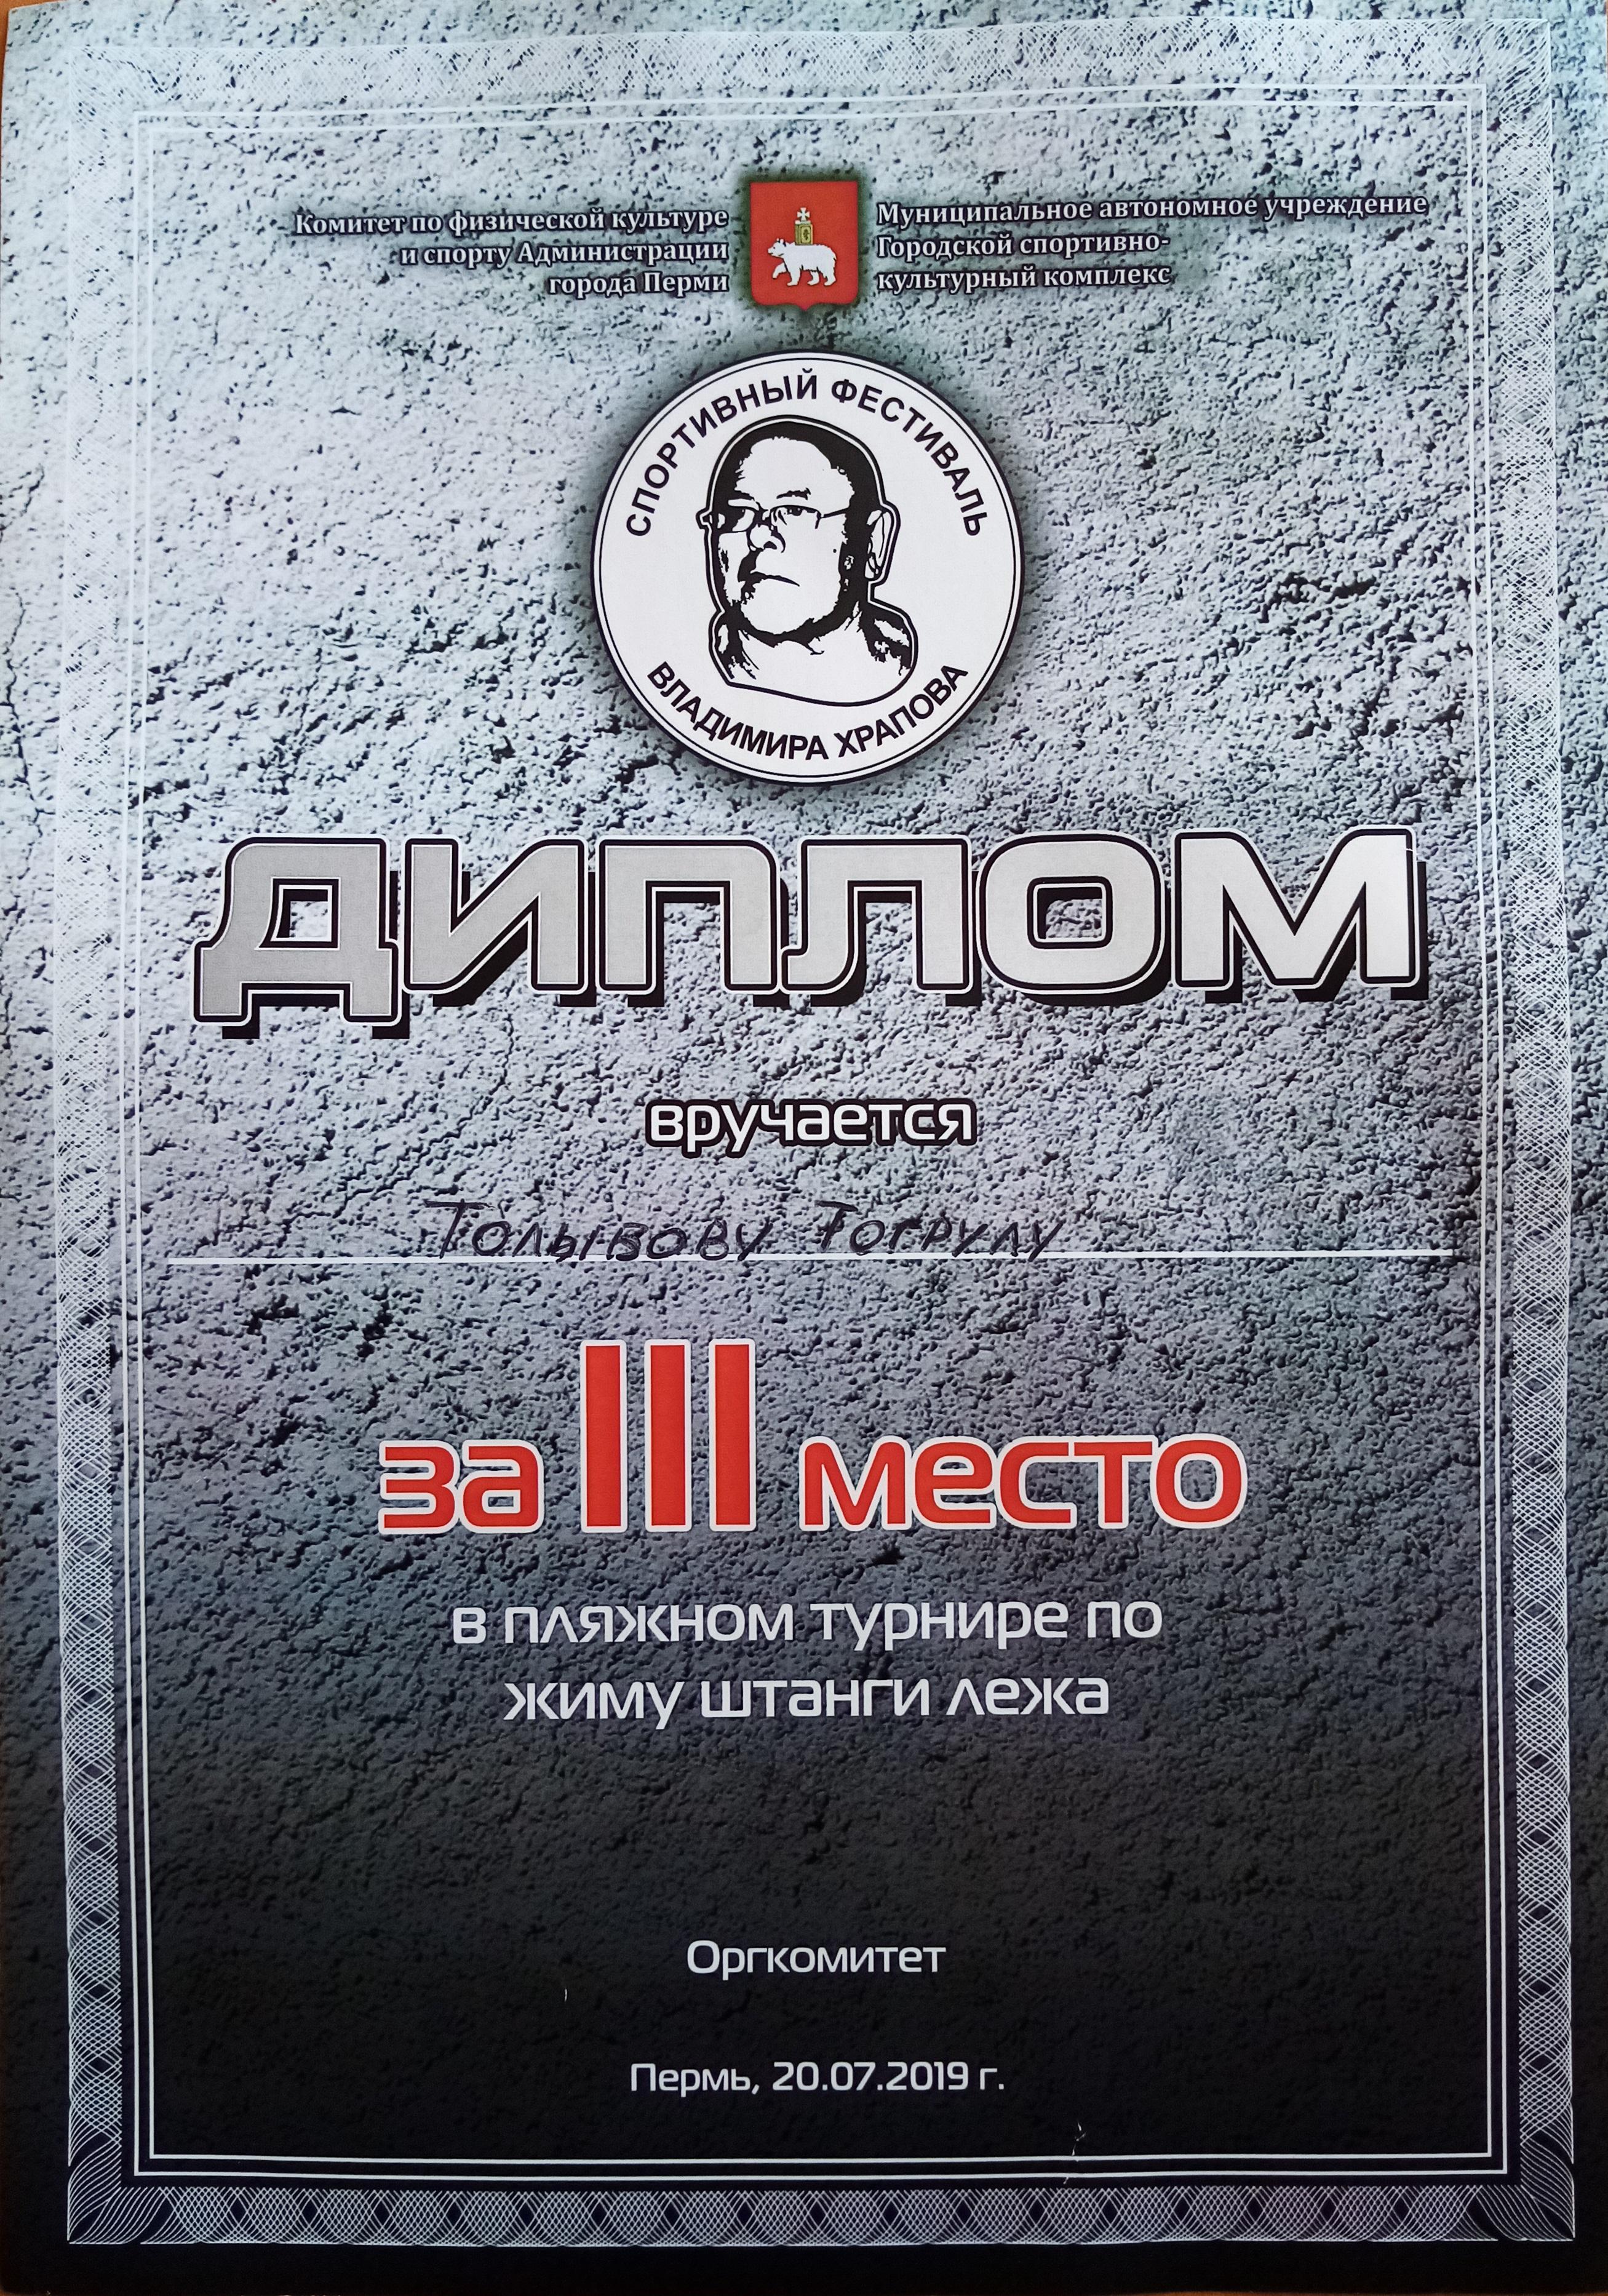 Диплом IV Спортивный фестиваль им. Храпова